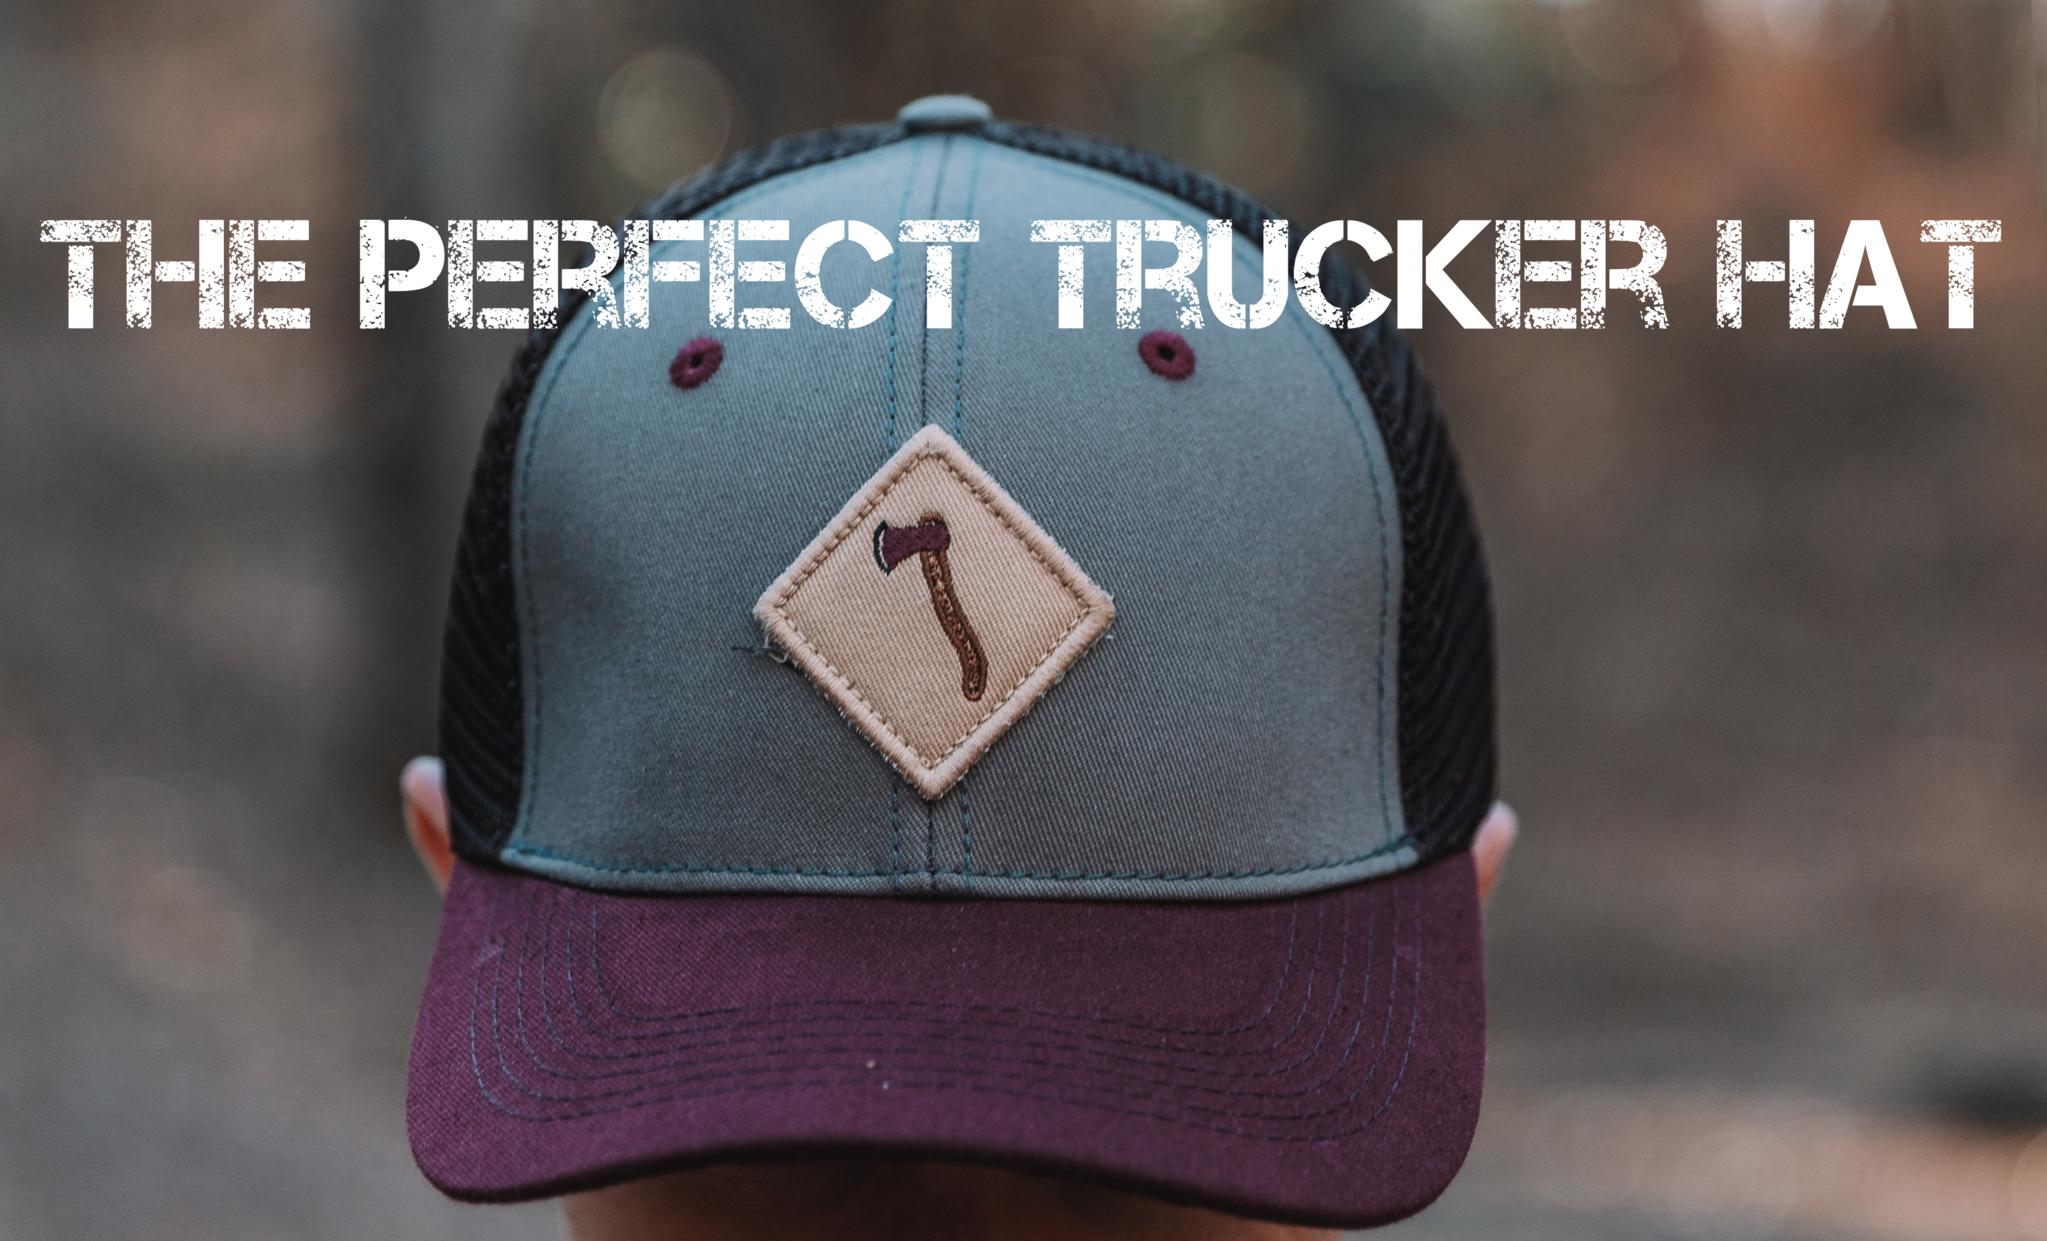 Best Selection of Trucker Hats